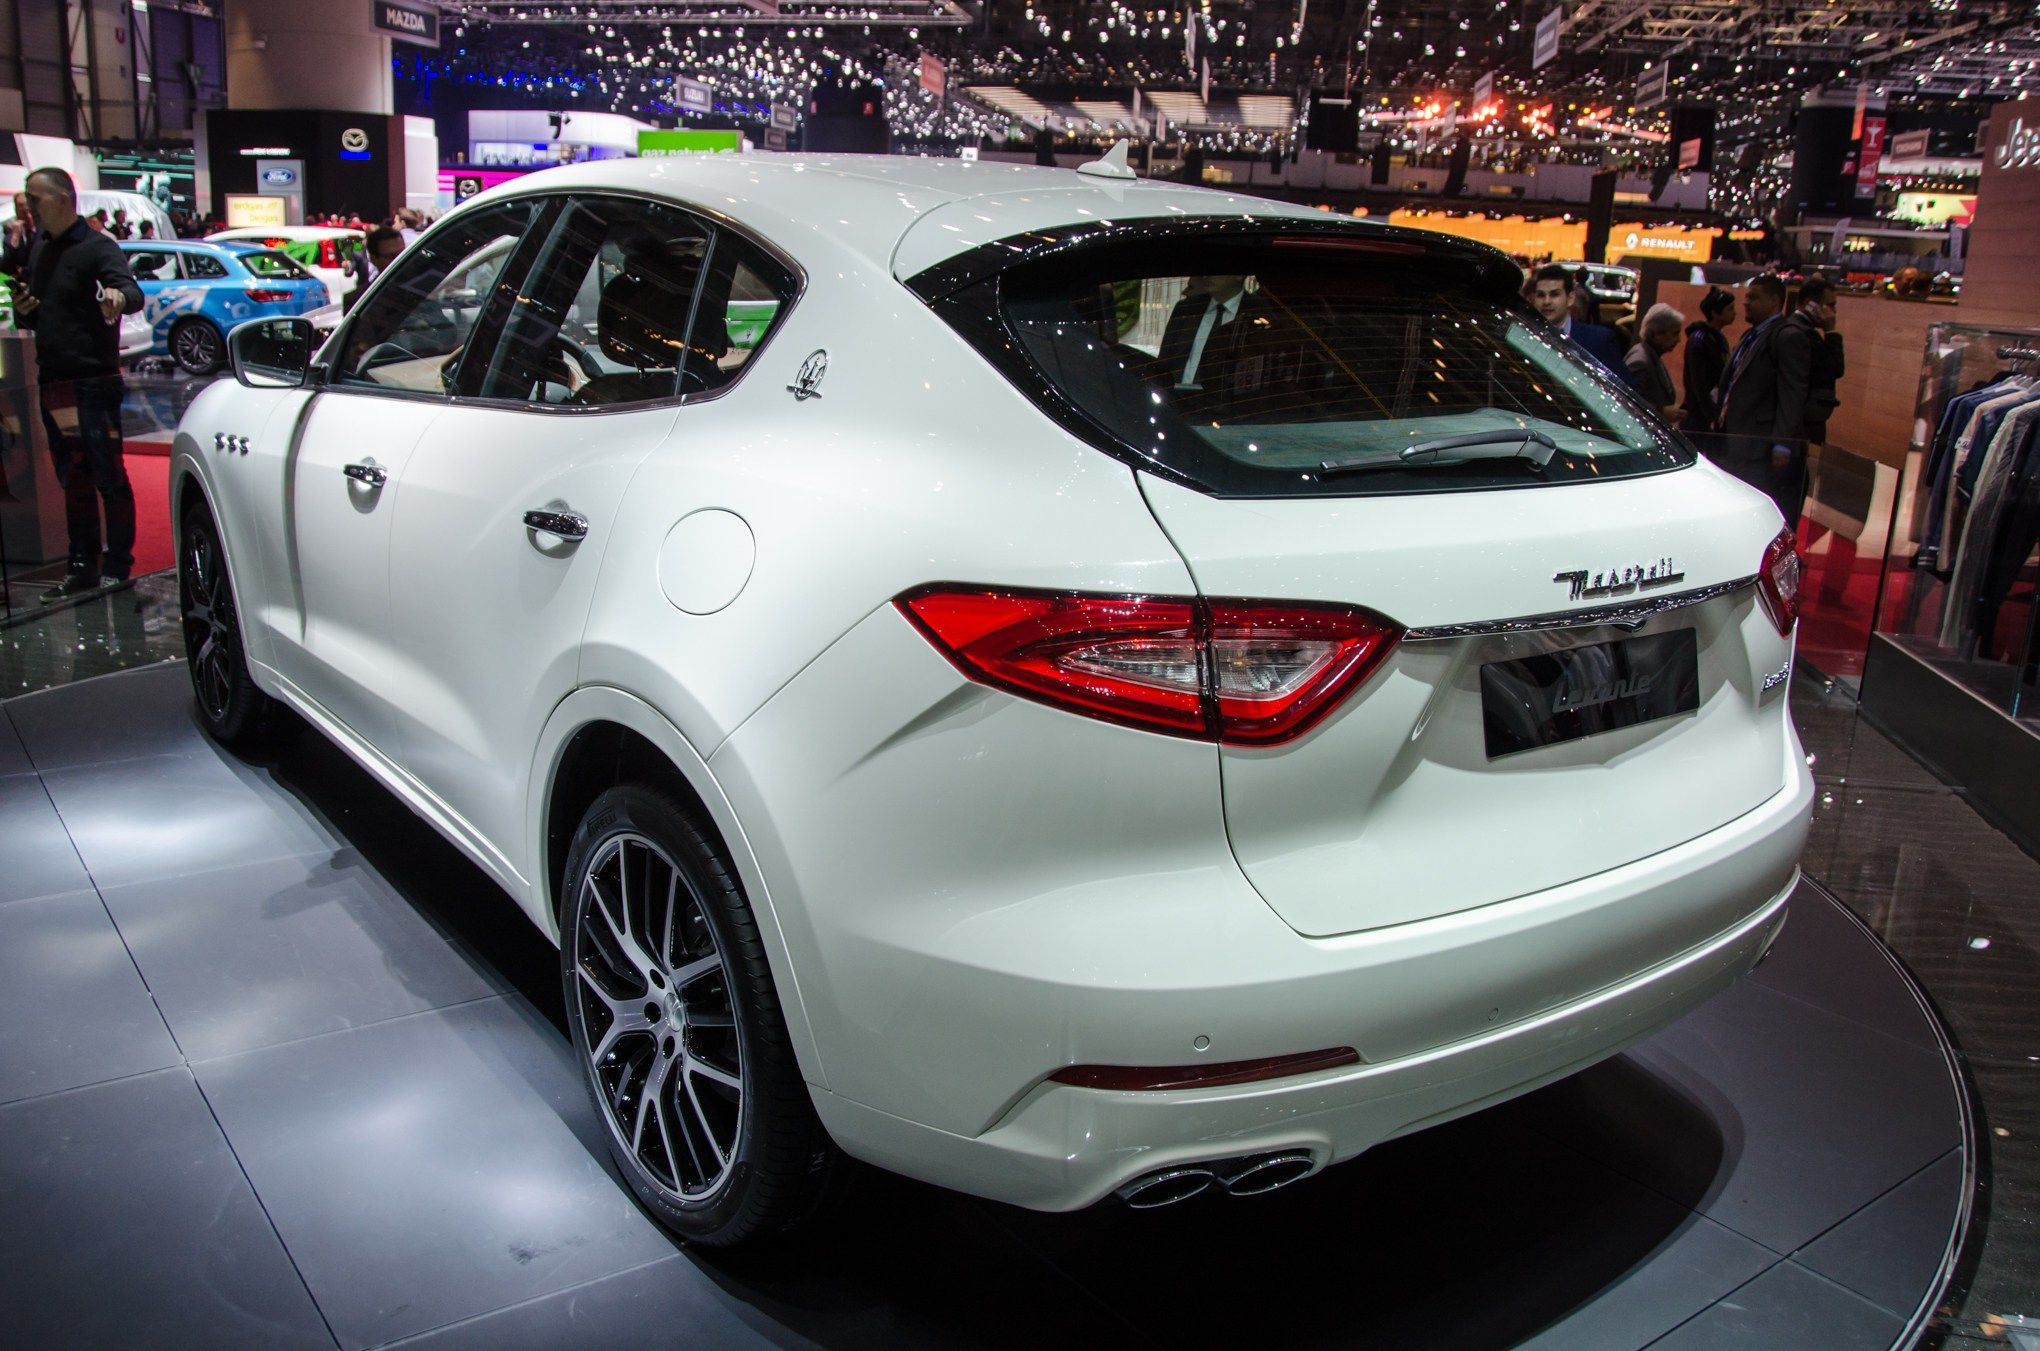 2017 Maserati Levante Suv Interior Price Car Reviews